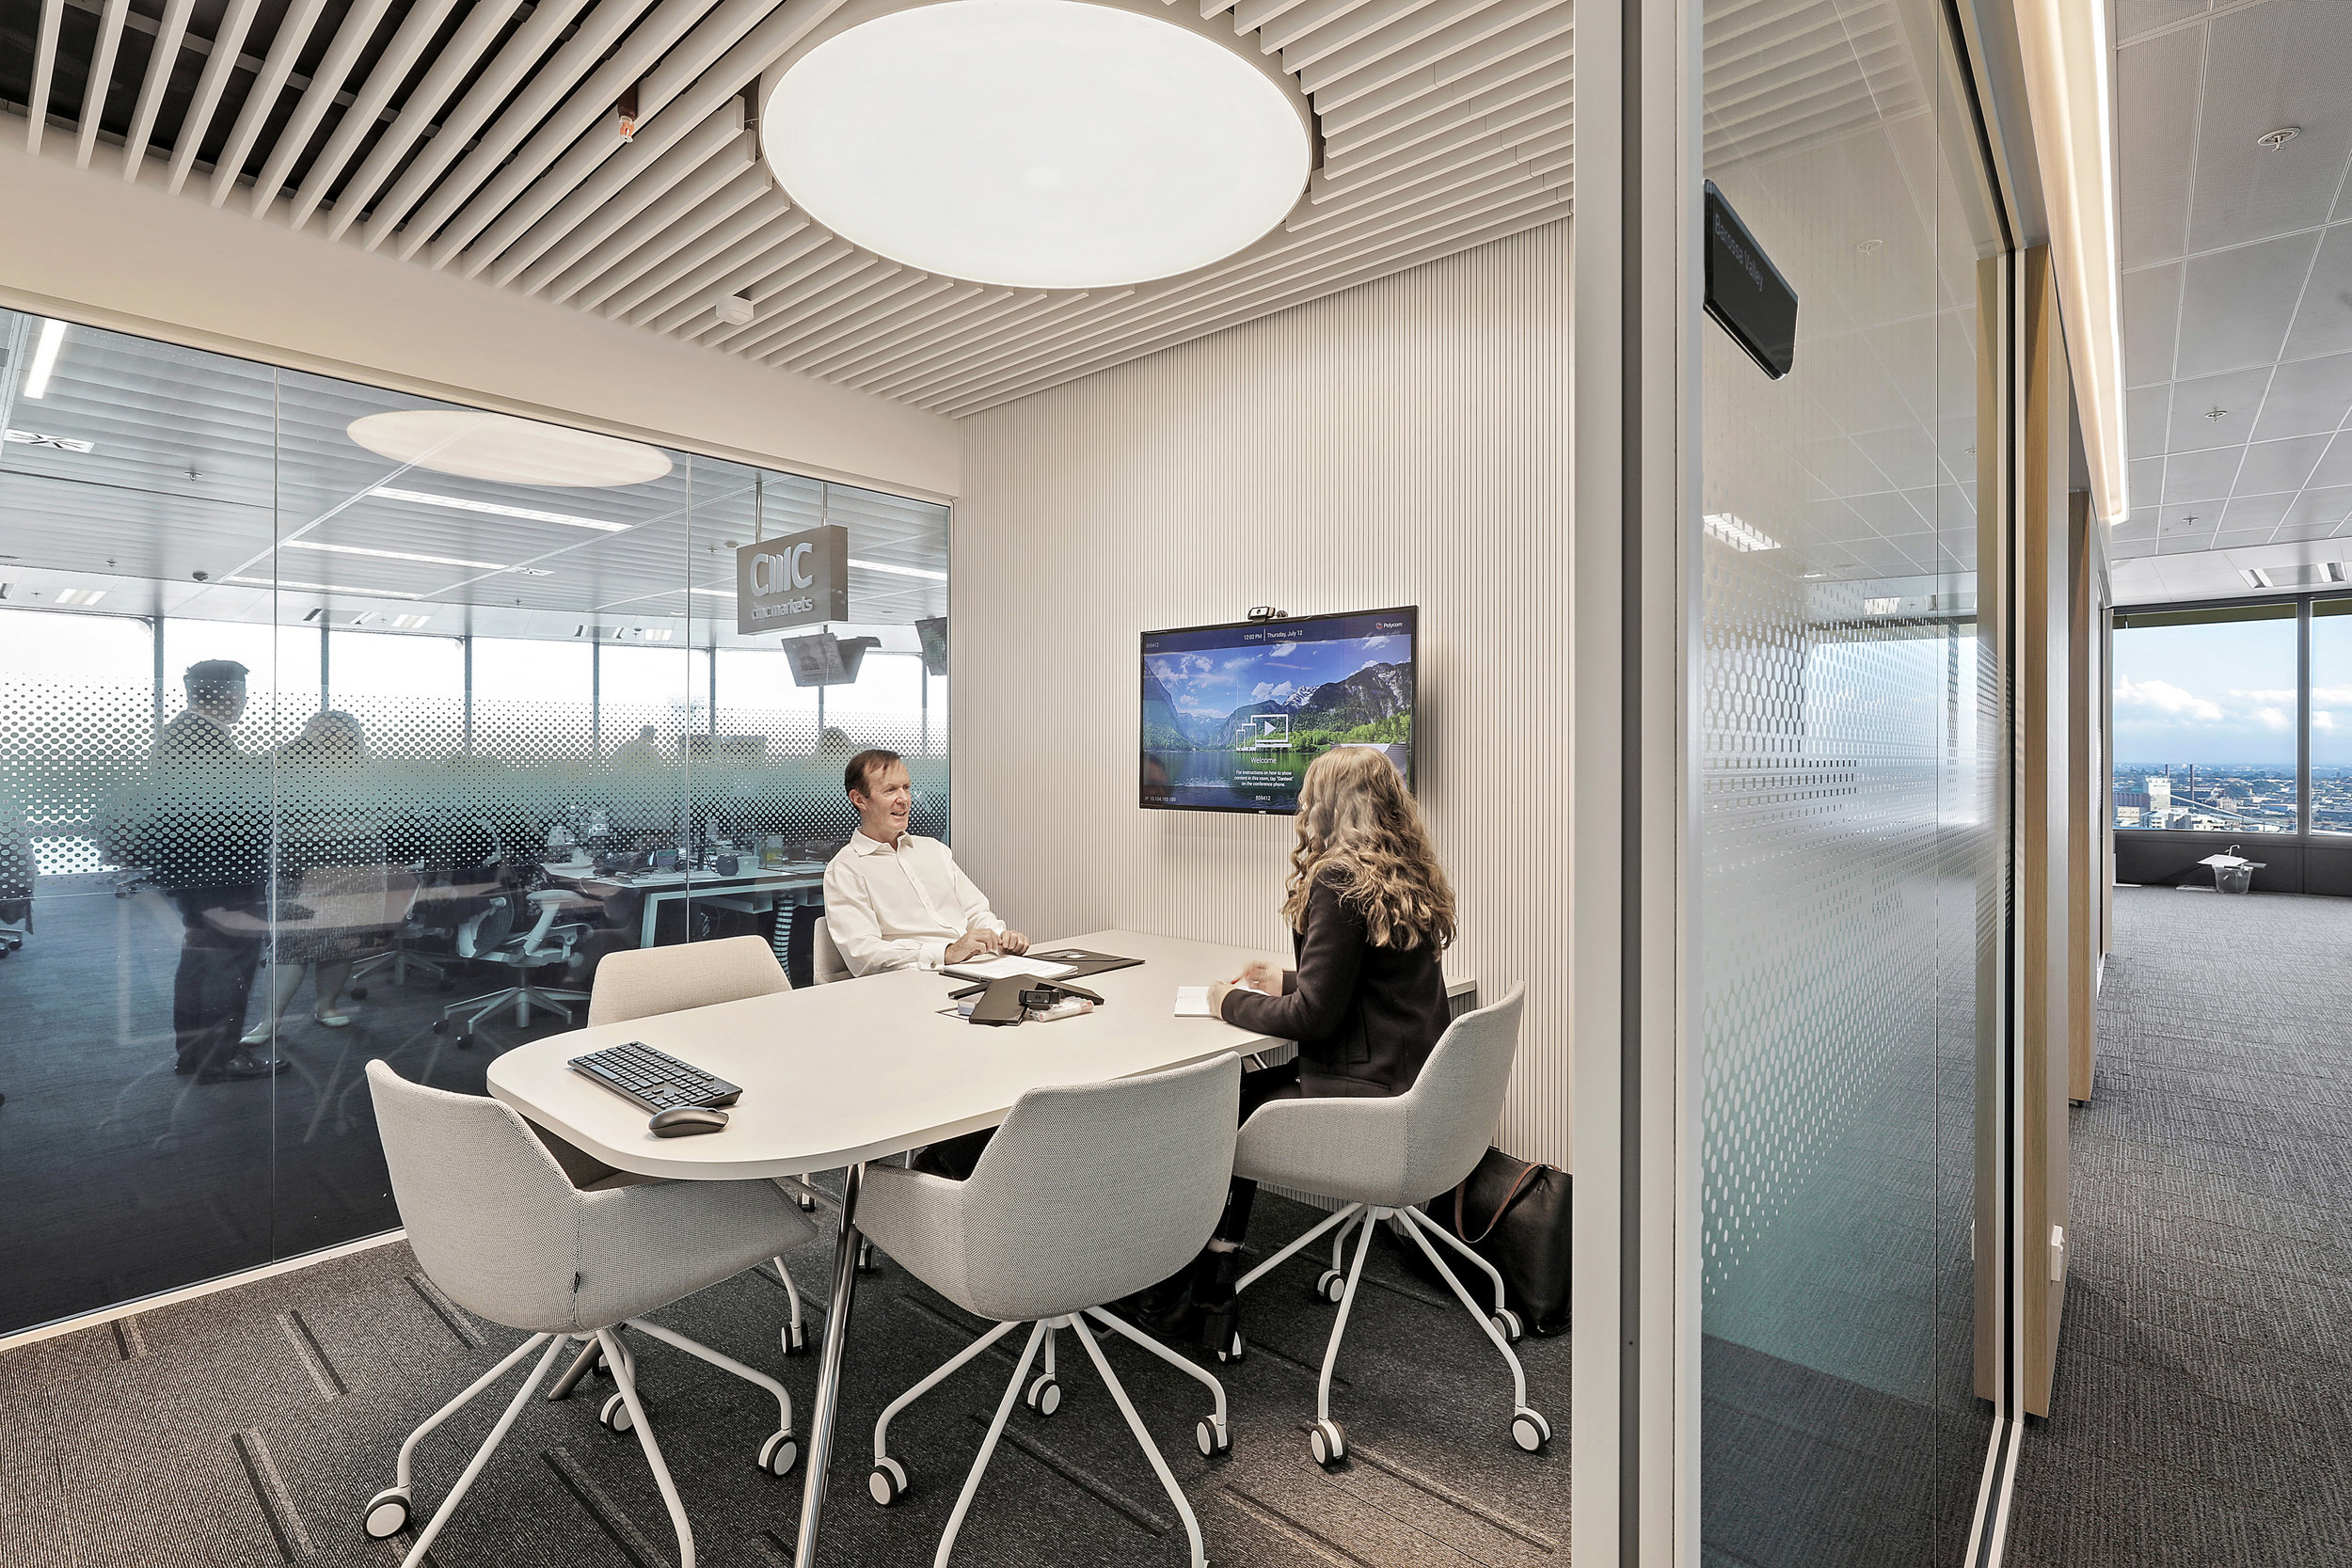 CMC_Markets_L20_3_International_Towers_Barangaroo_High_Meeting_Room_3.jpg